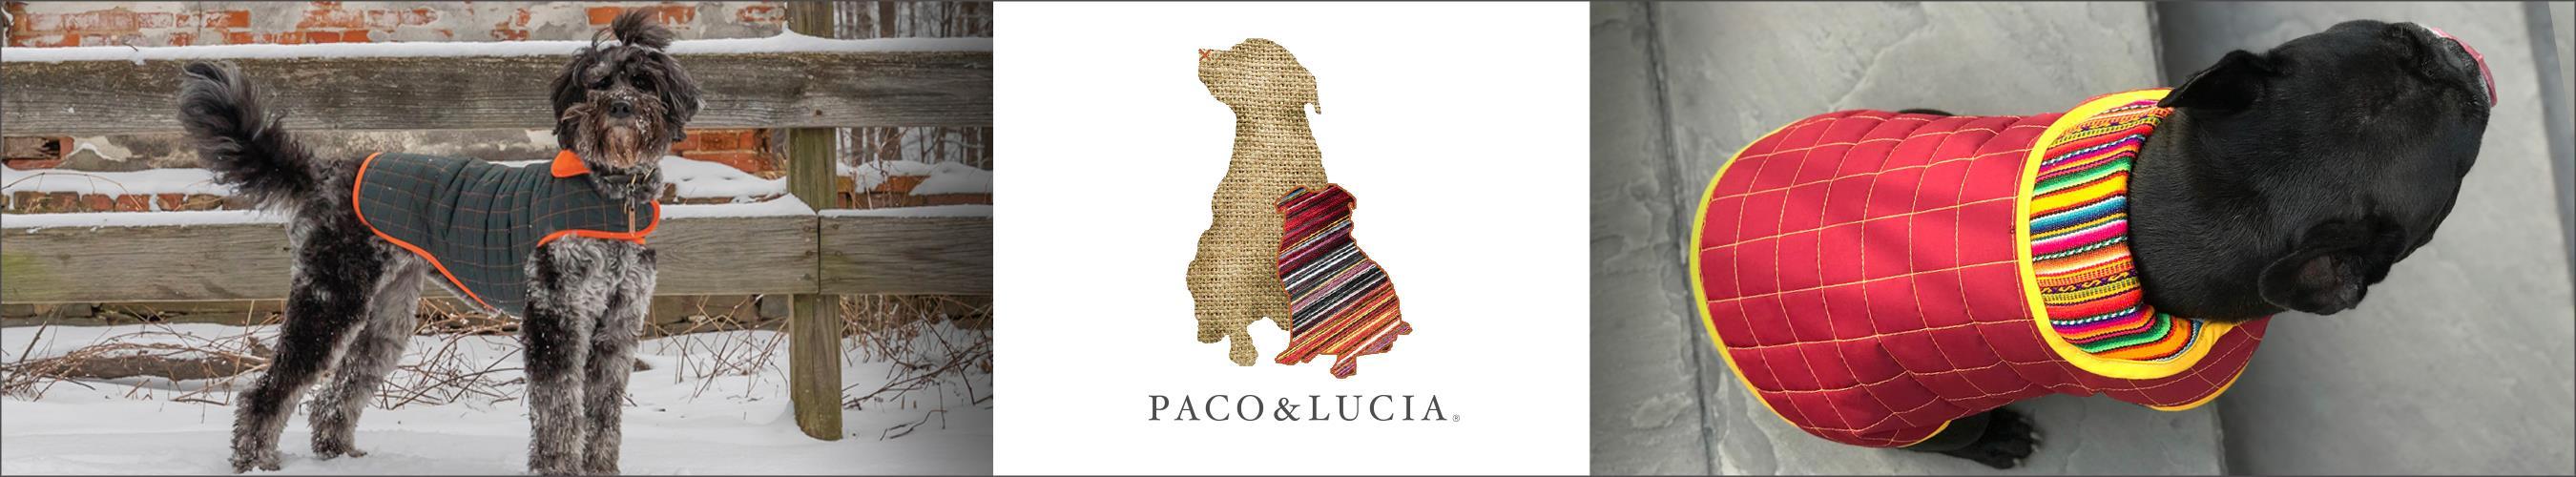 Paco & Lucia